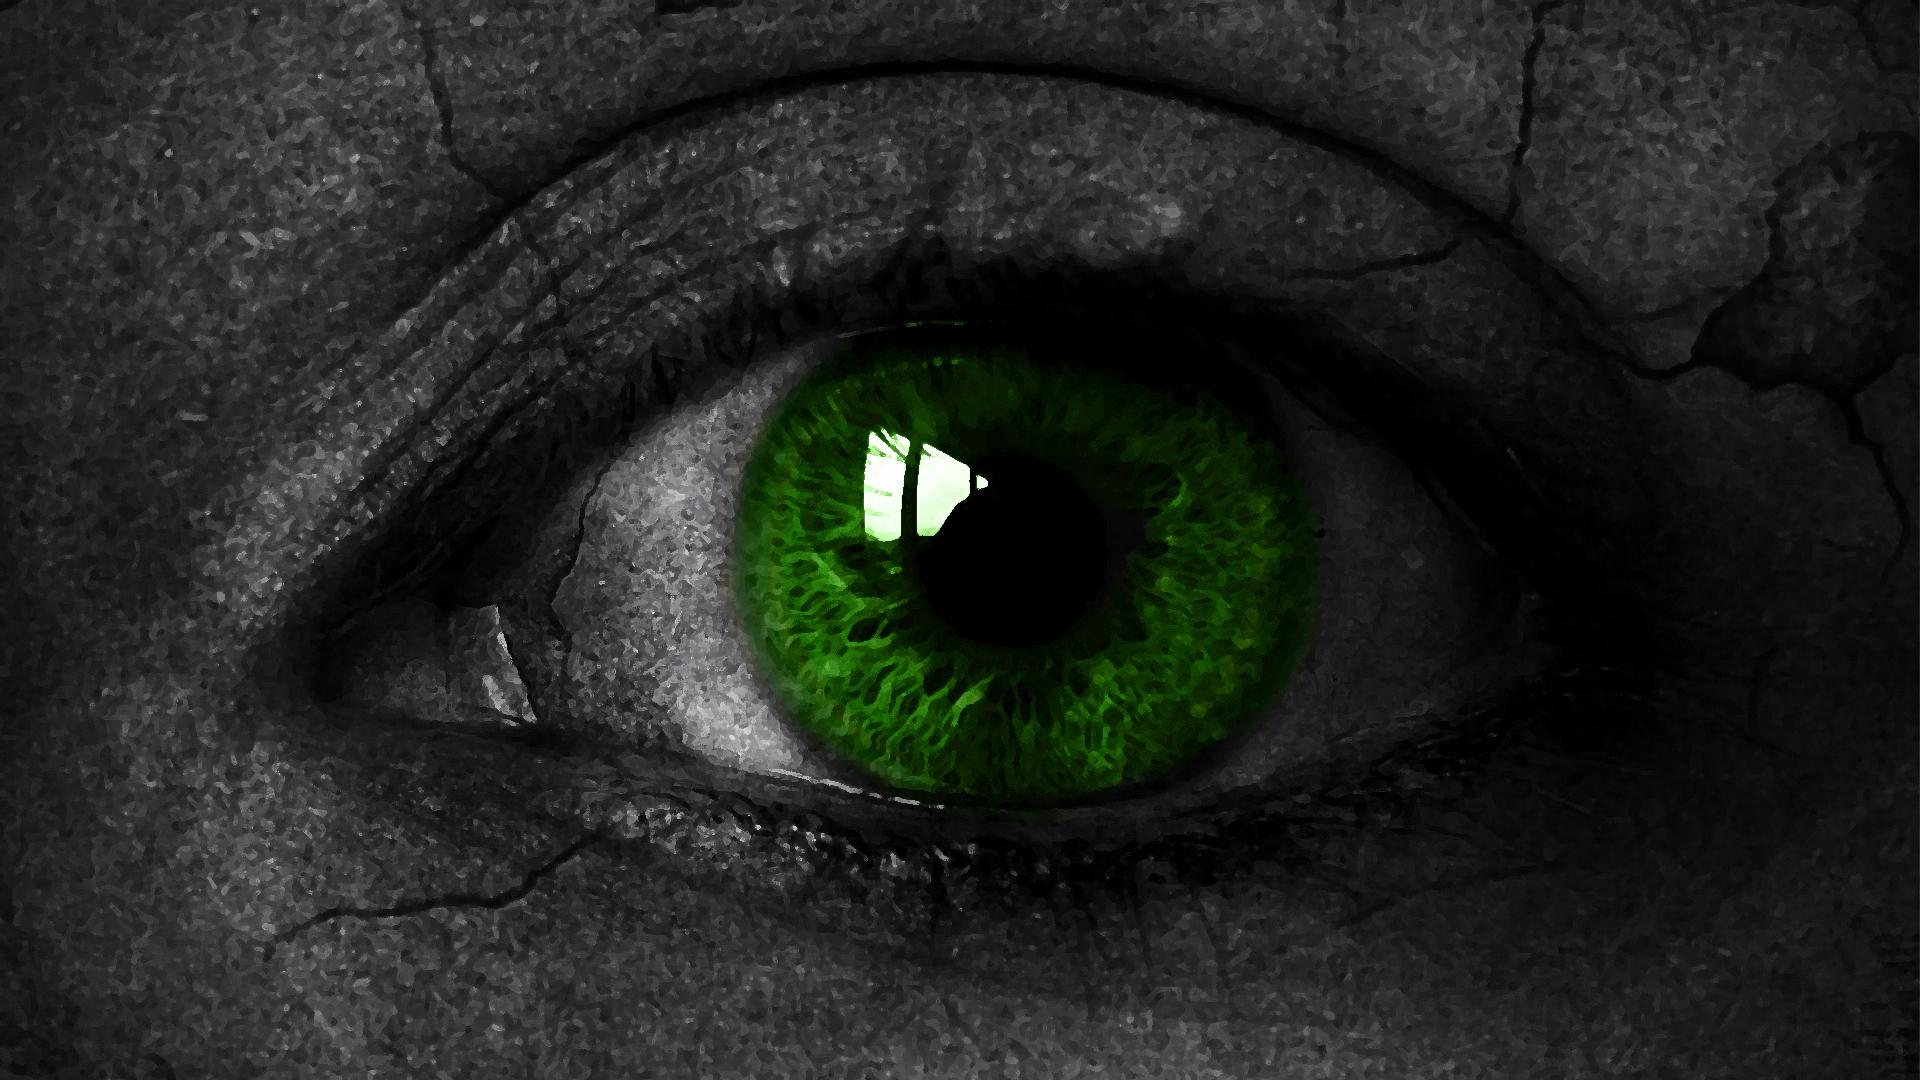 Close up eyes green eyes wallpaper 1920x1080 62337 1920x1080